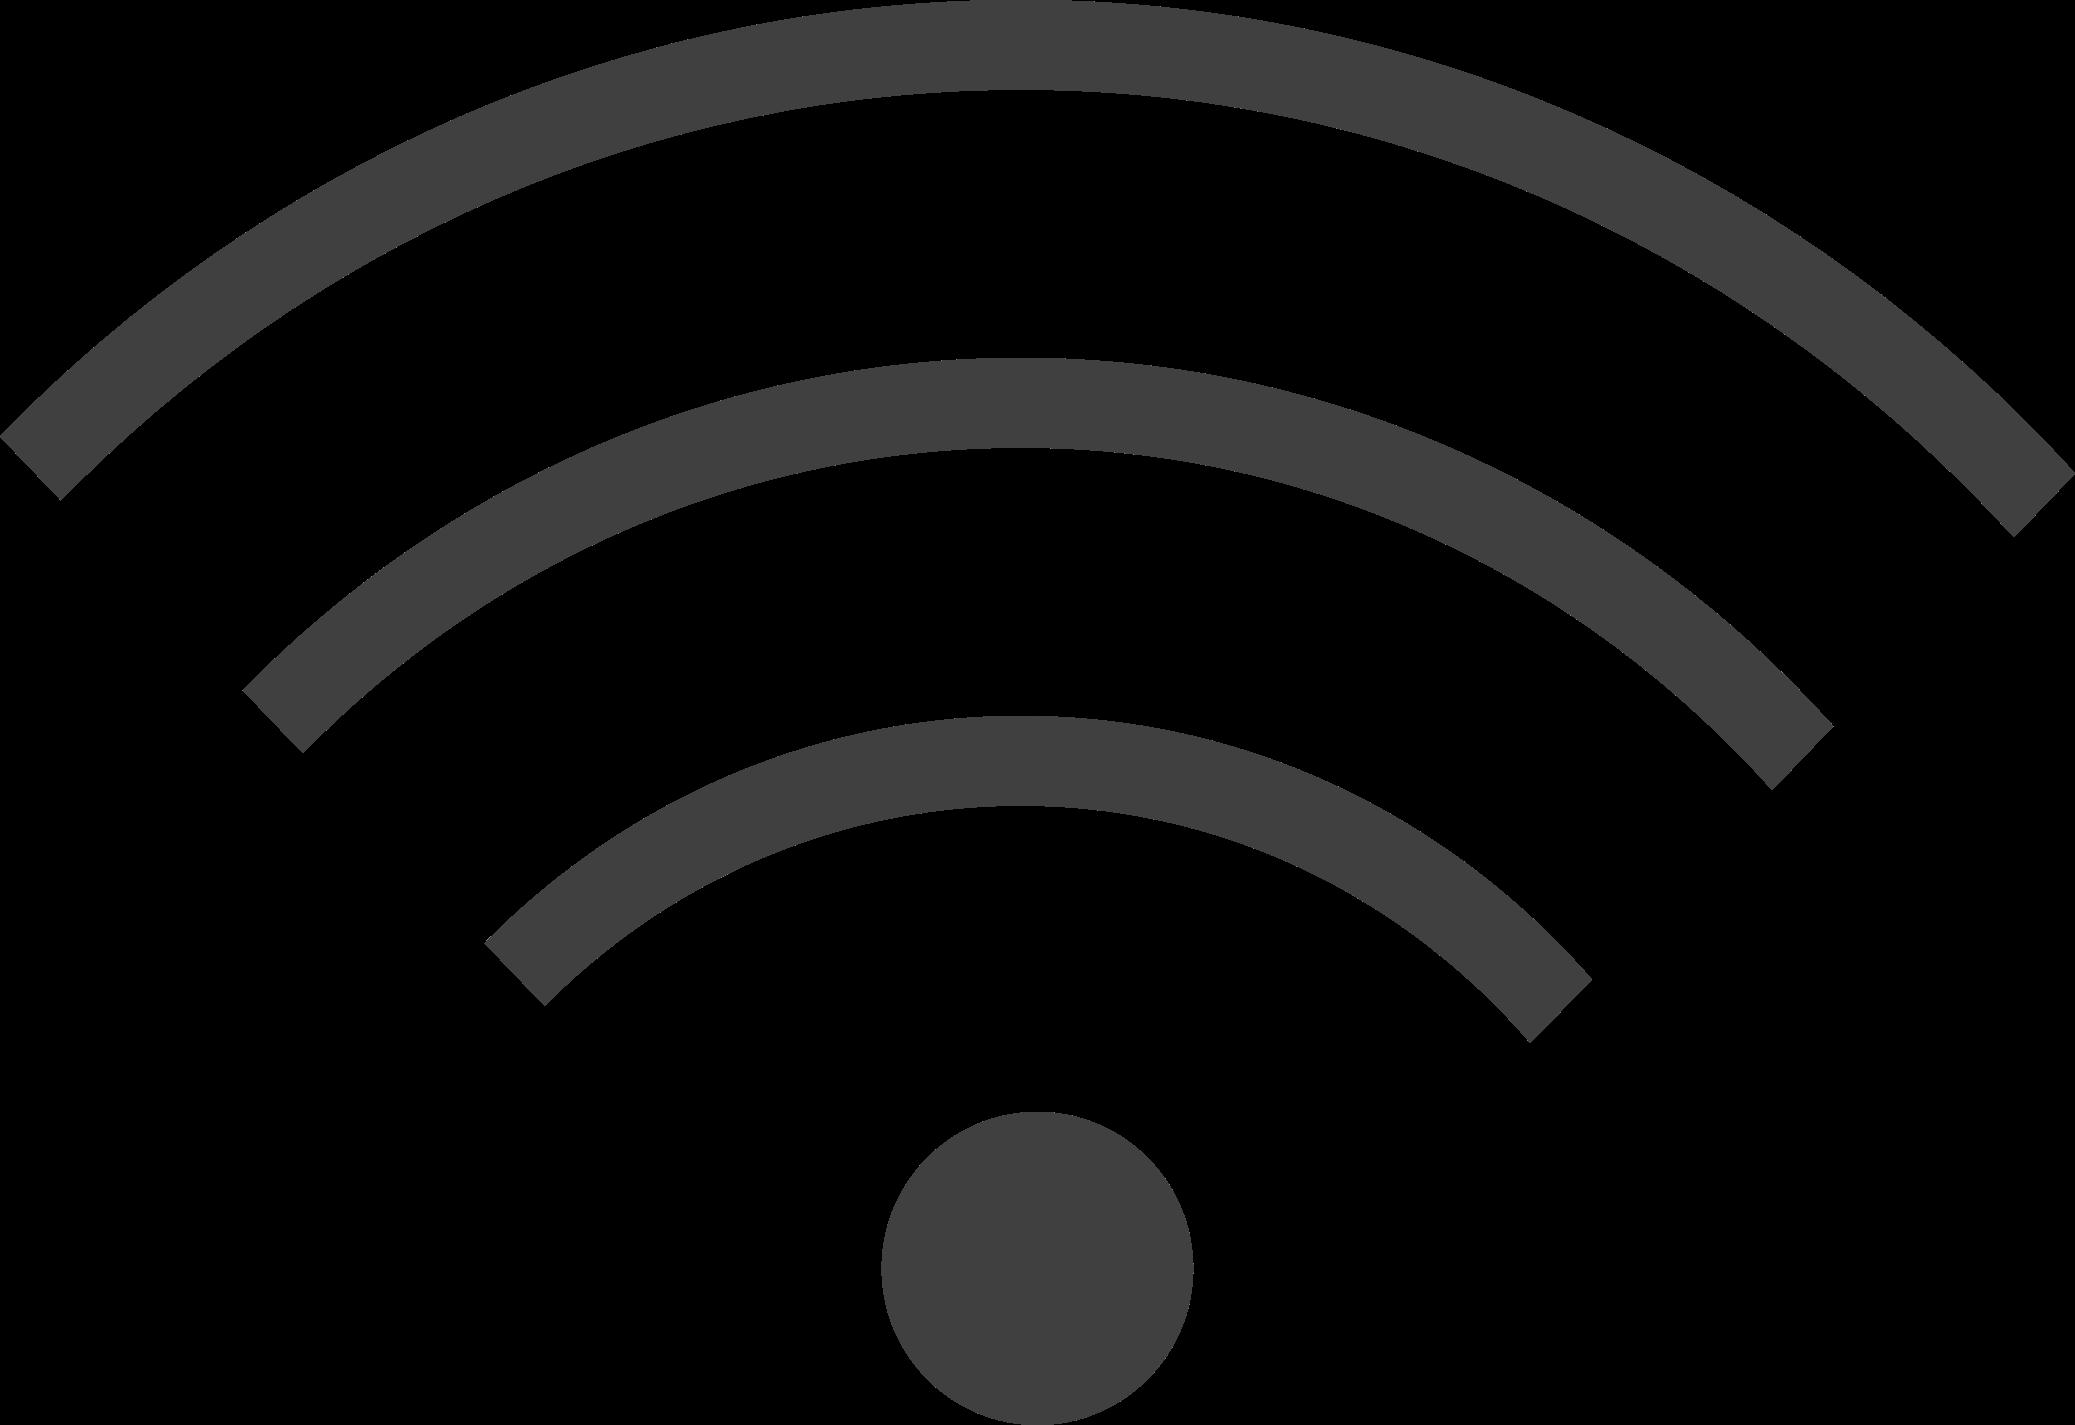 wifi clipart.